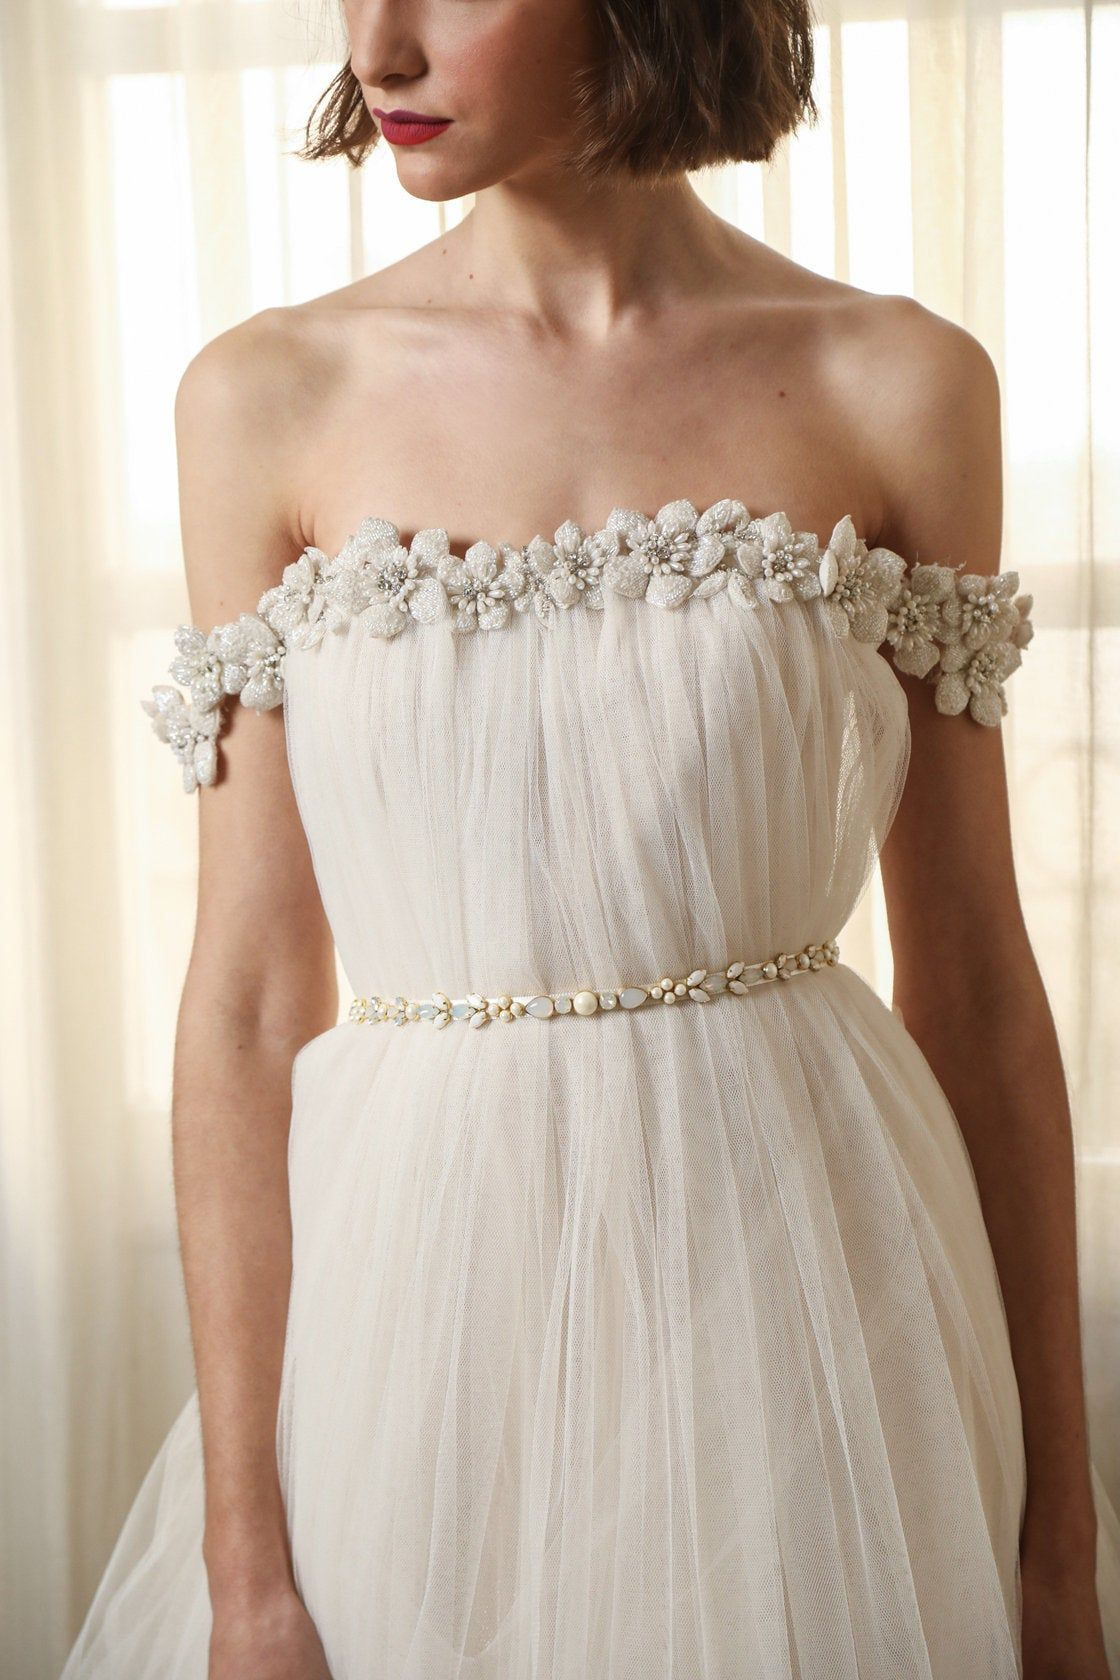 10 Beautiful Bridal Sashes Belts Wedding Dresses Bridal Sash Belt Dresses [ 1680 x 1120 Pixel ]